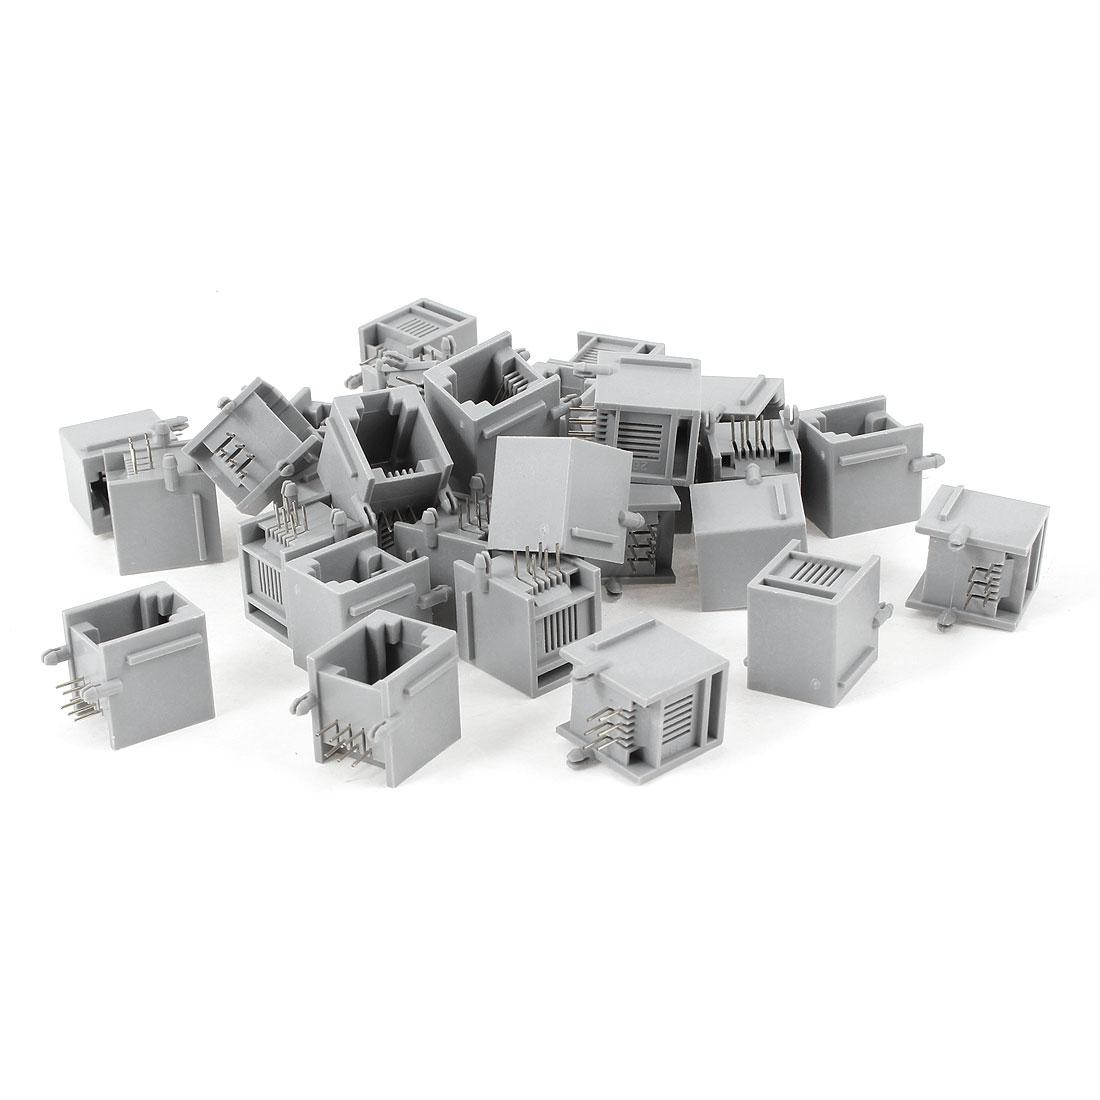 30 Pcs Gray Plastic RJ12 6P6C 6 Round Pin Network Modular PCB Connector Jacks